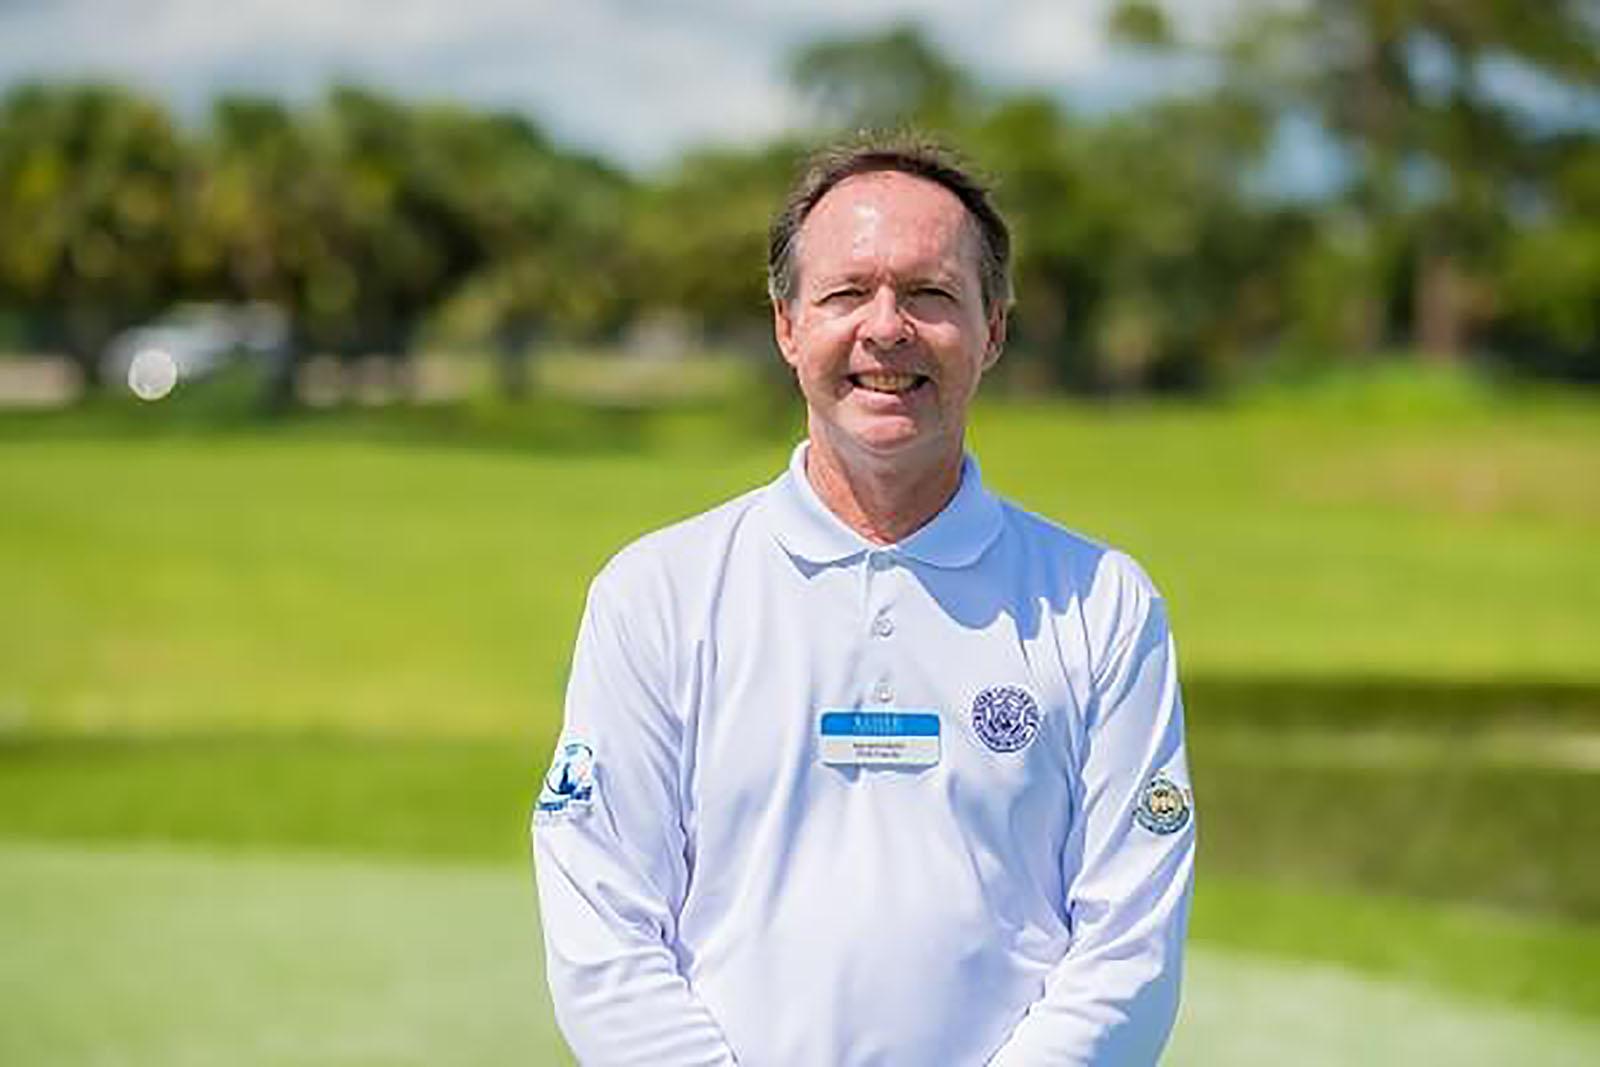 Keiser University College of Golf Professor Caddies at the Masters Golf Tournament